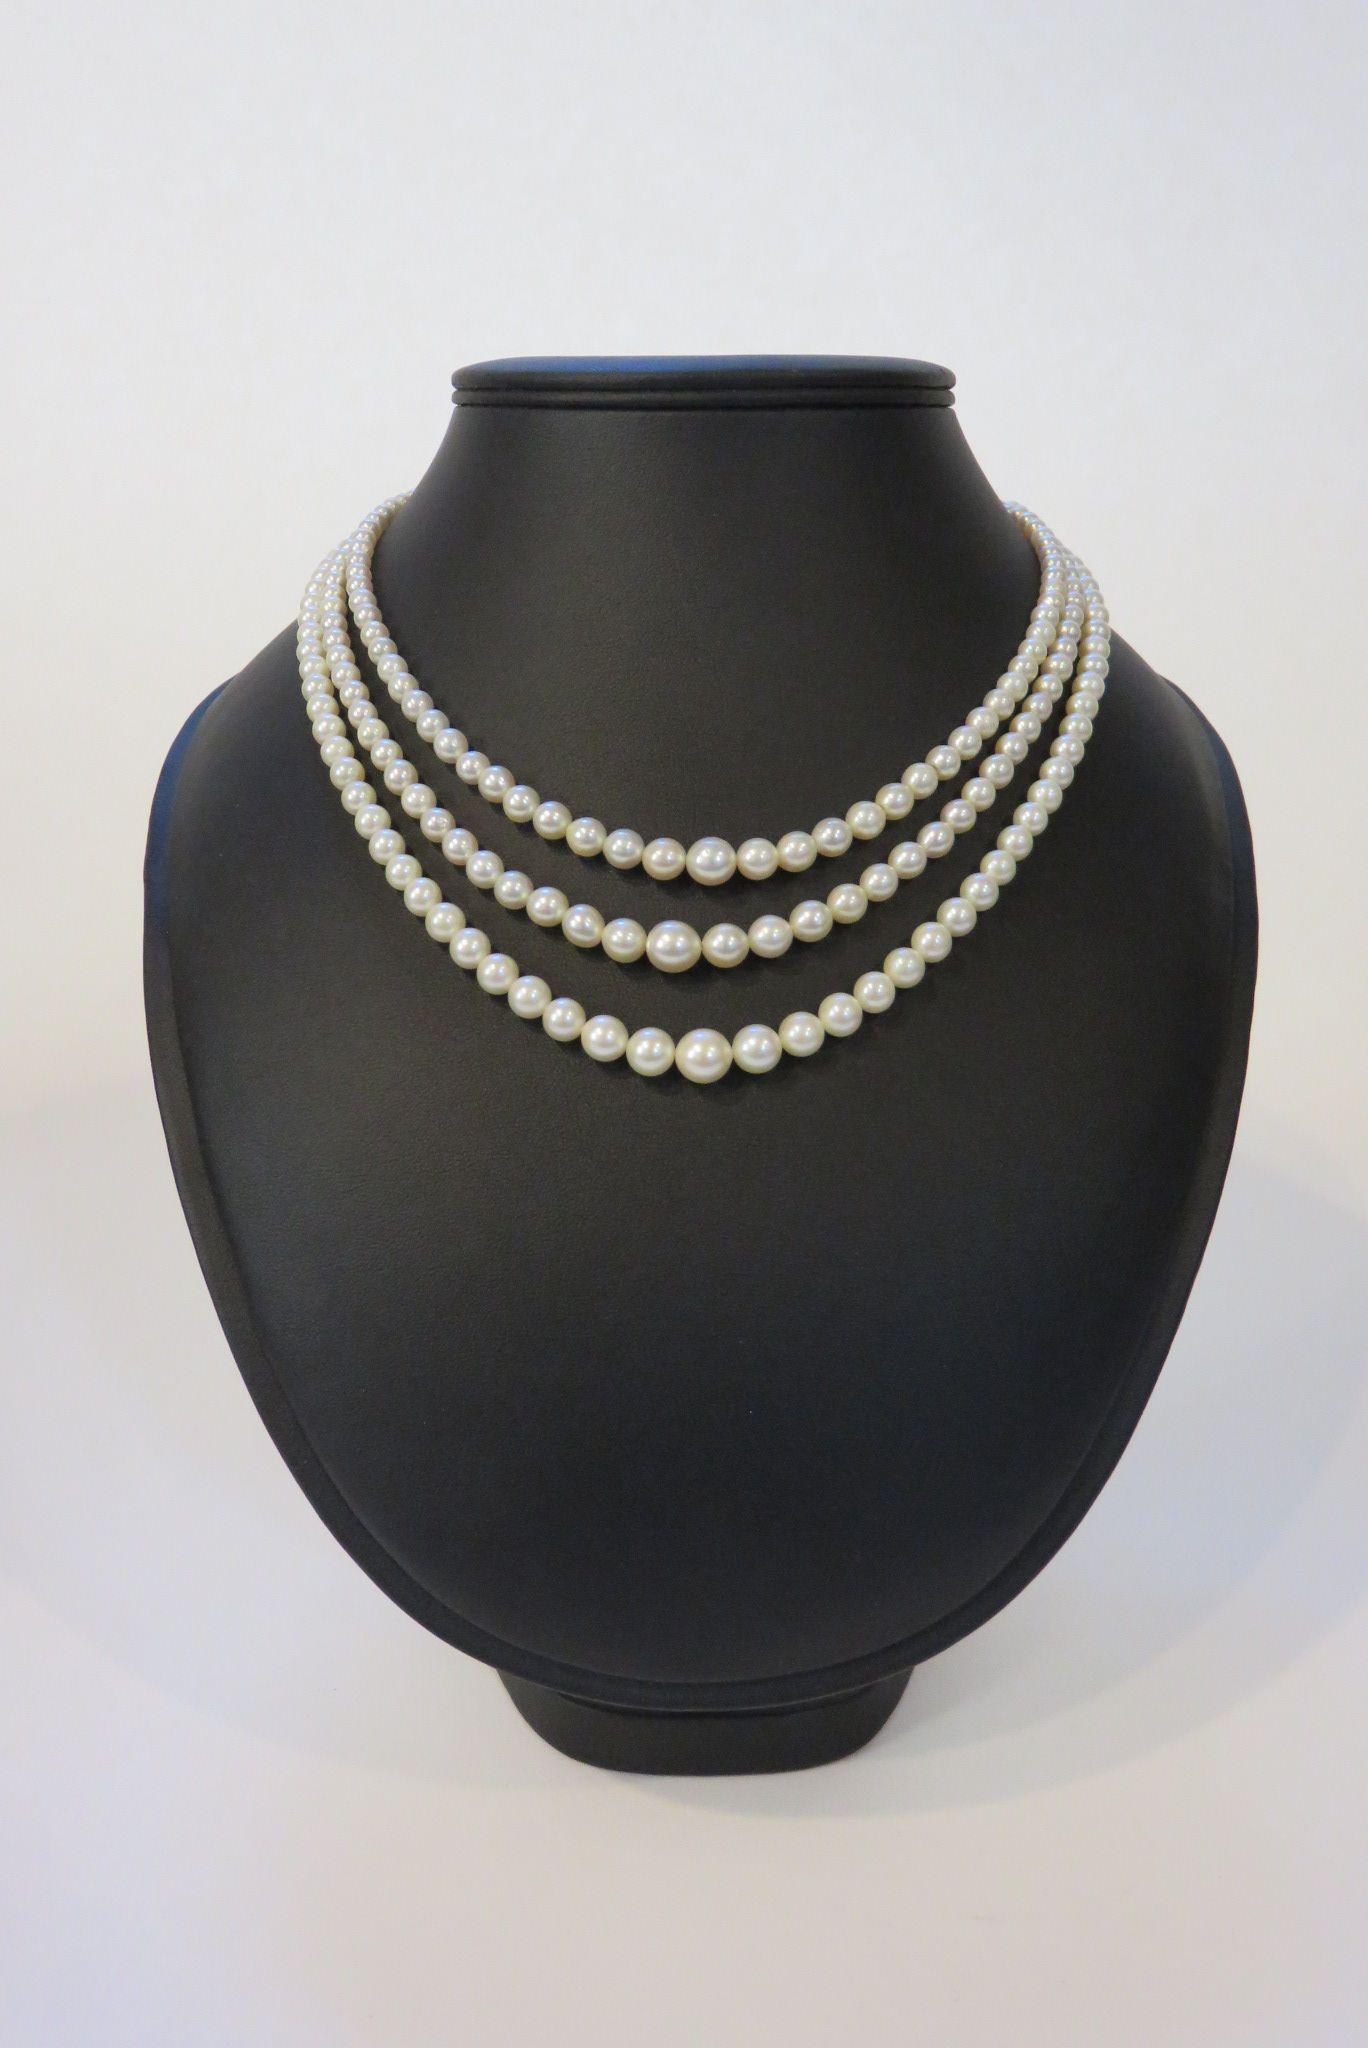 c0cebf01db6 Collier trois rangs de perles de culture en chute